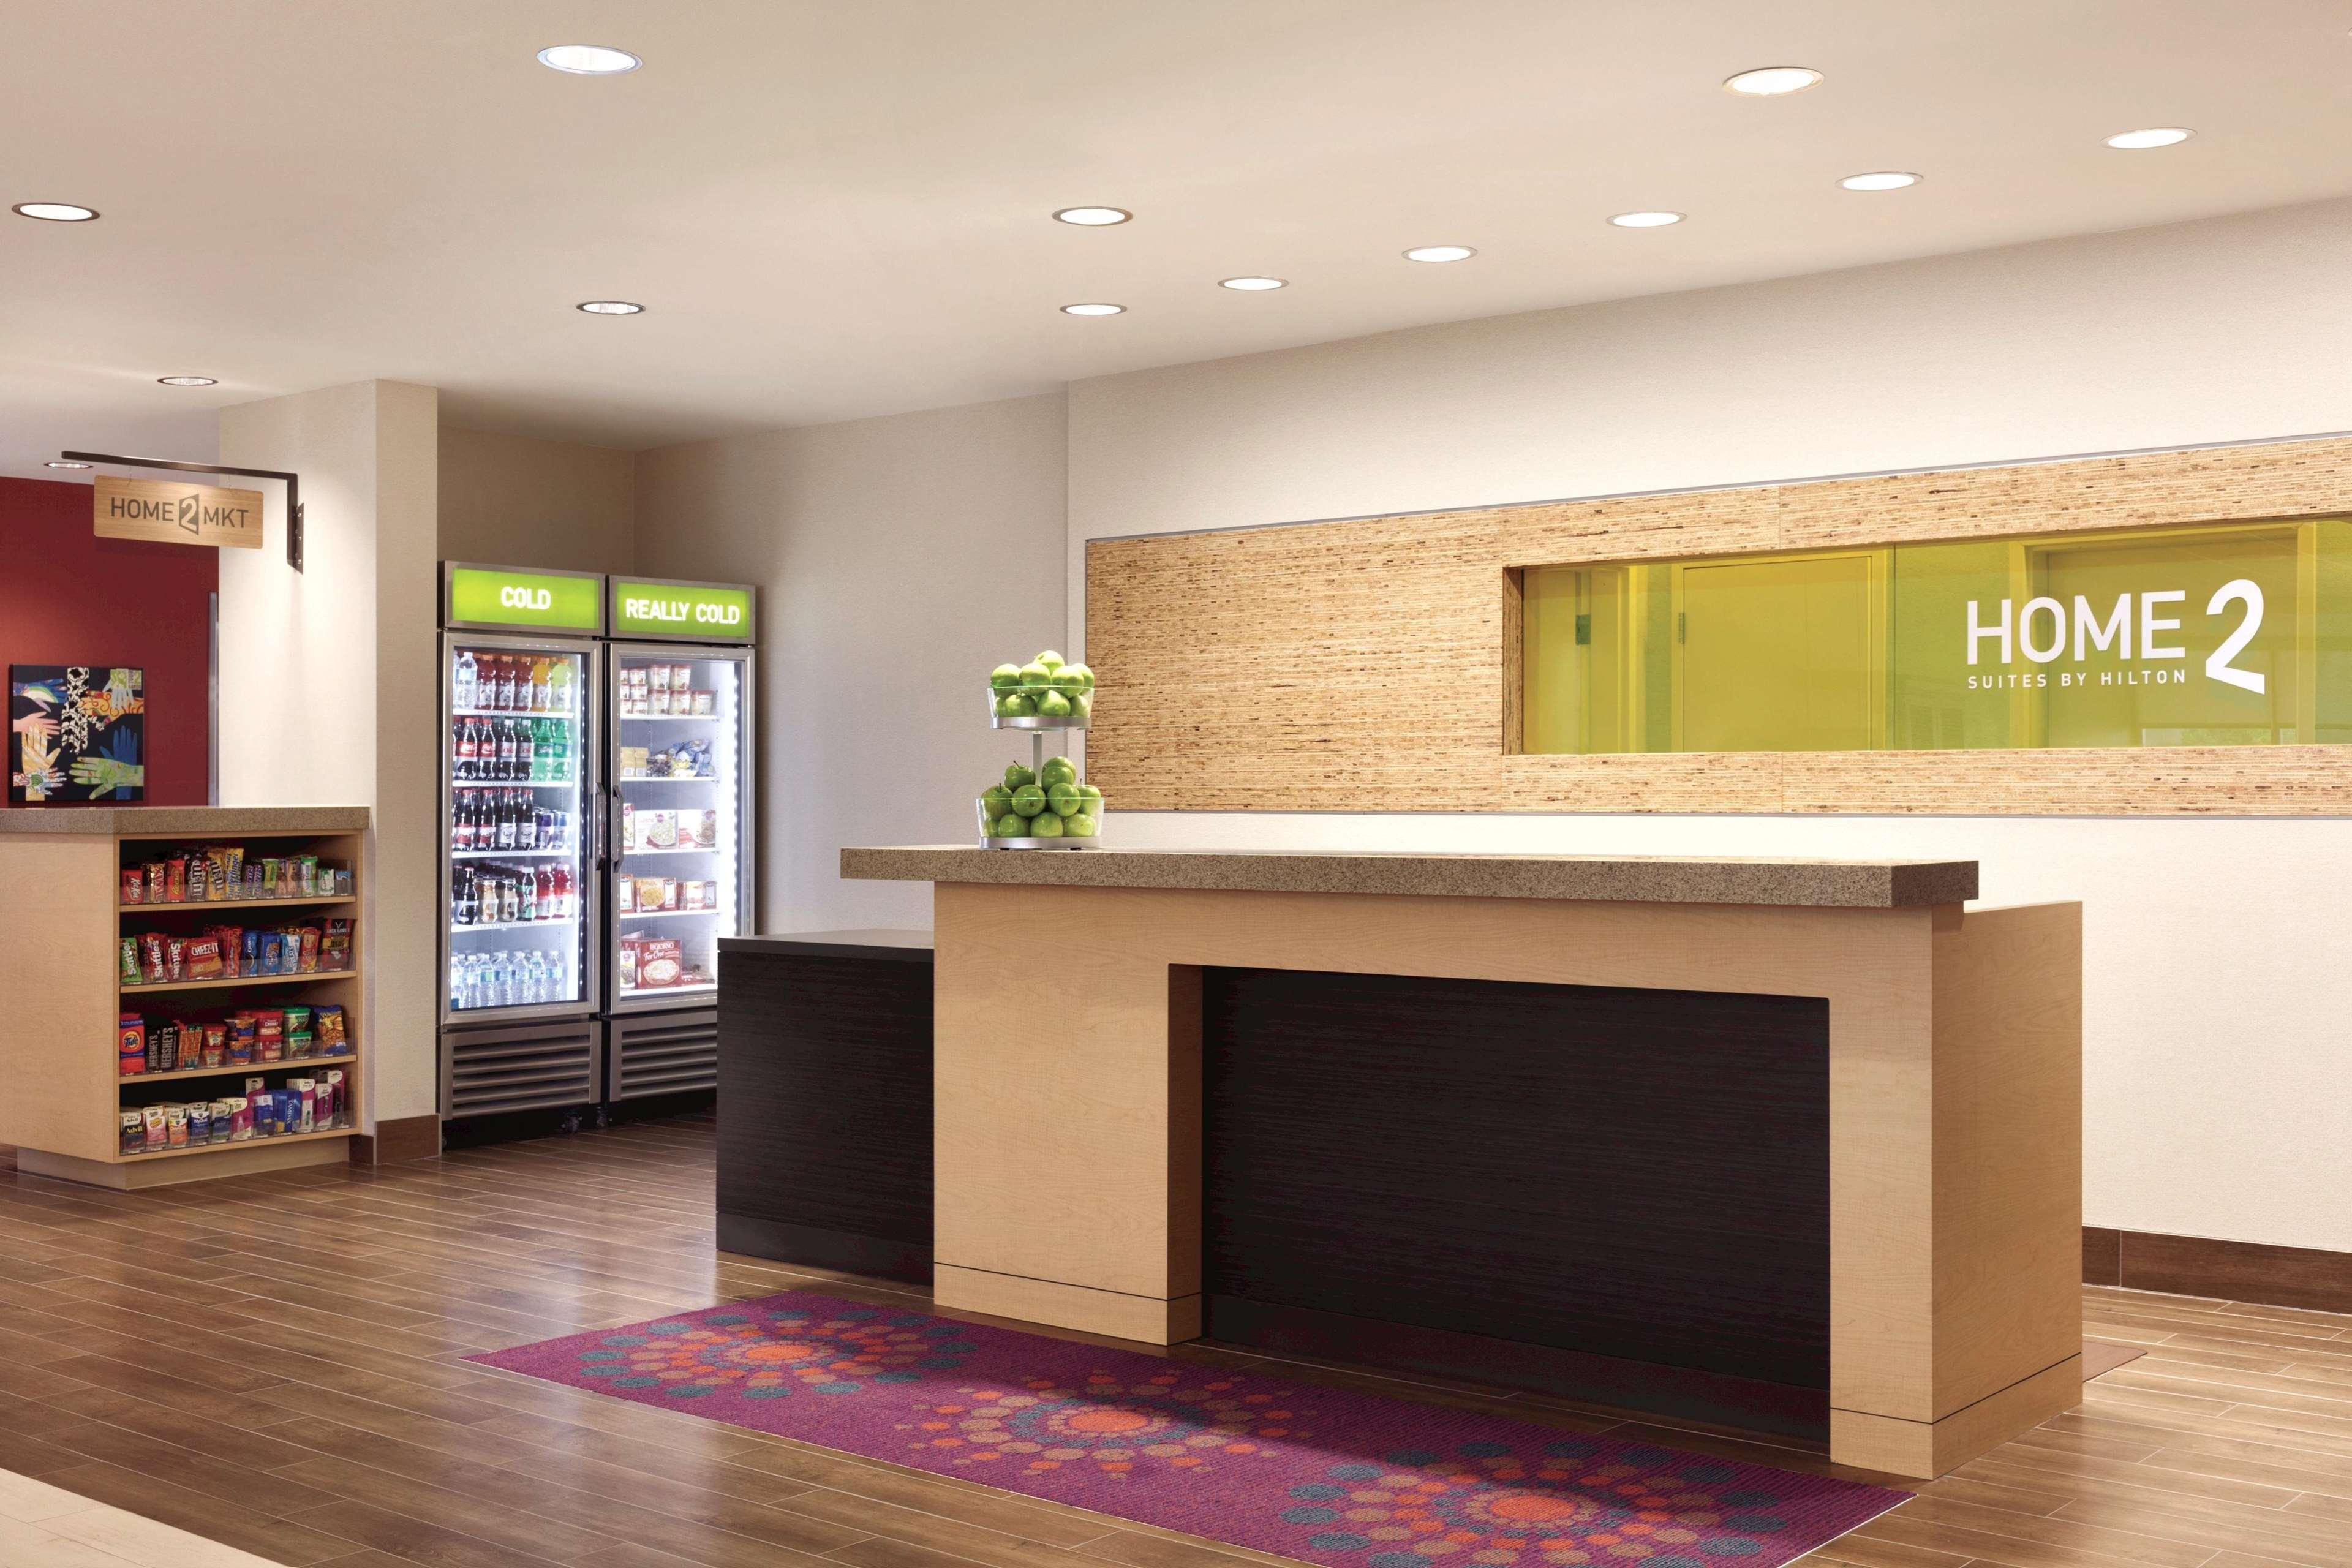 Home2 Suites by Hilton Austin Round Rock image 17